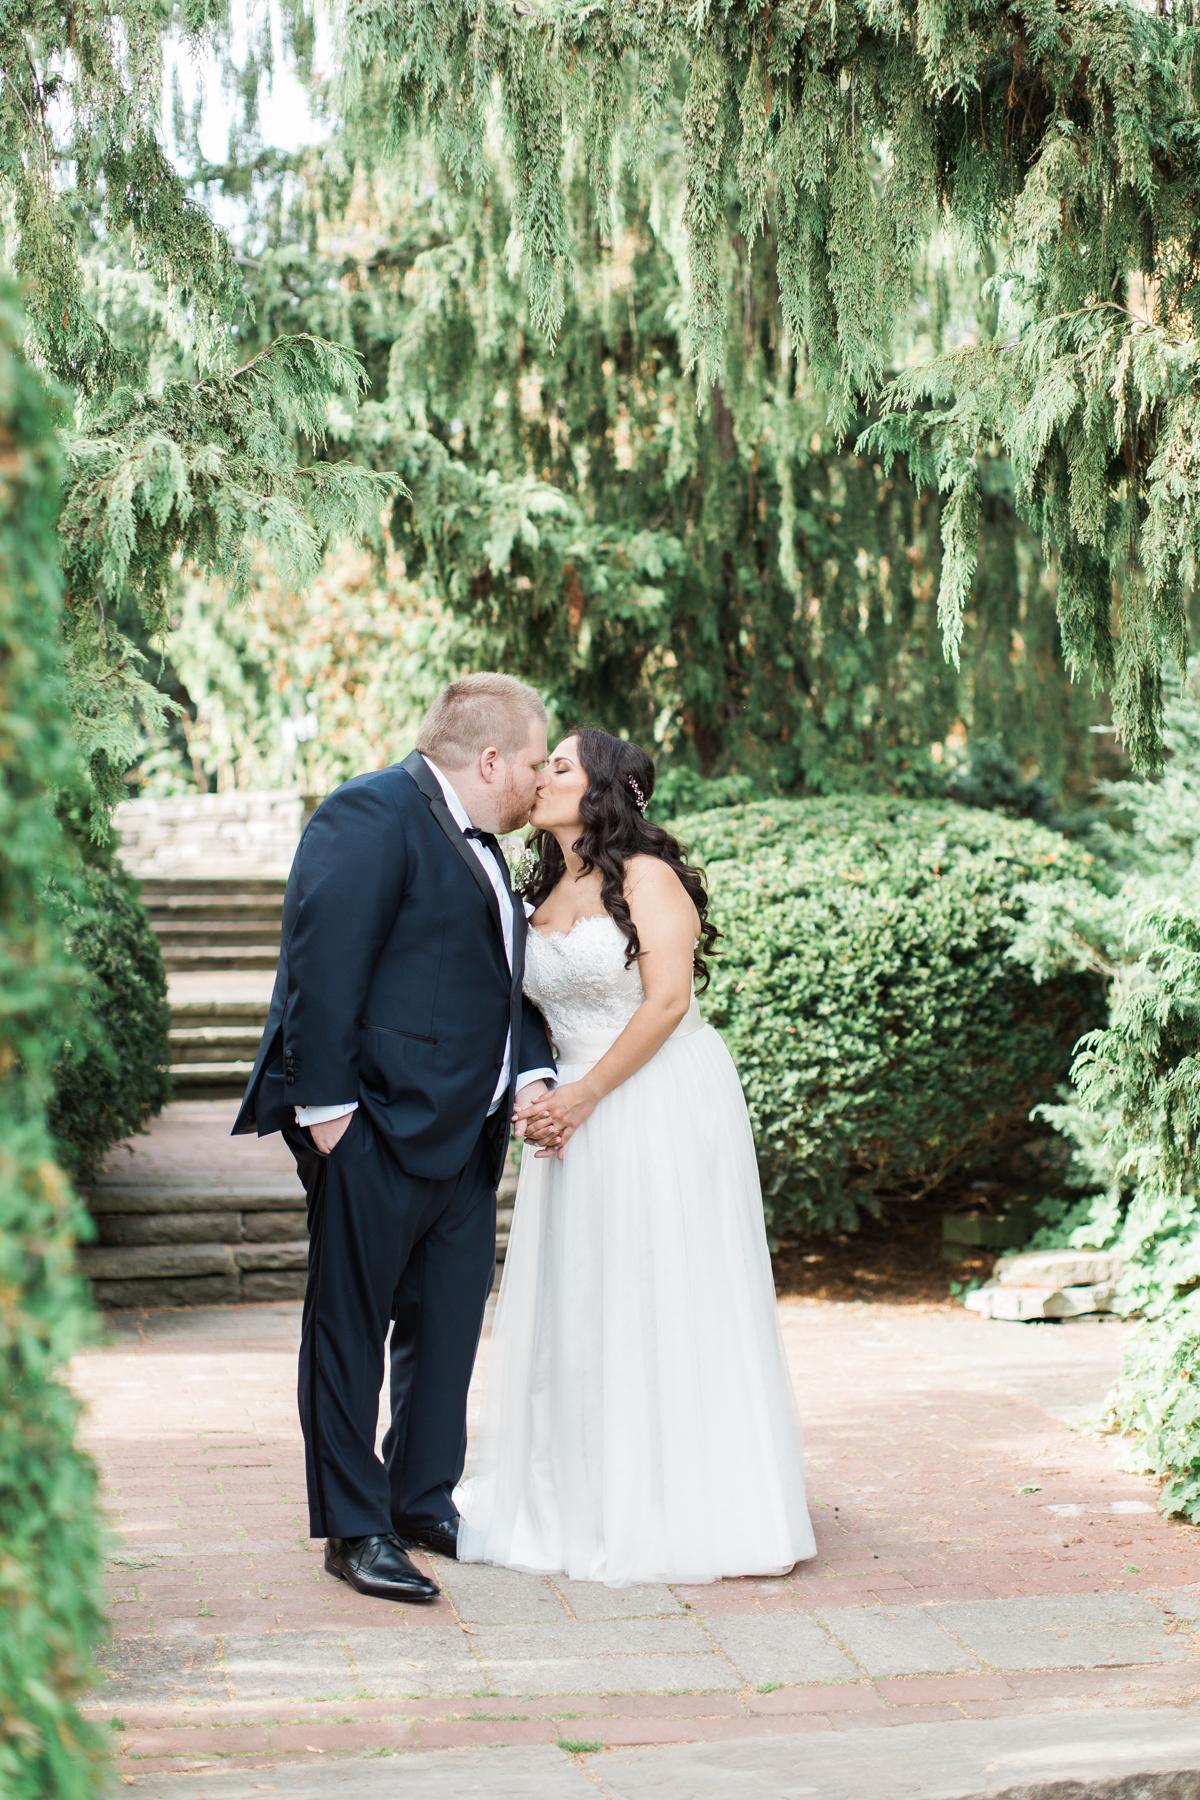 wedding photos at alexander muir gardens in toronto